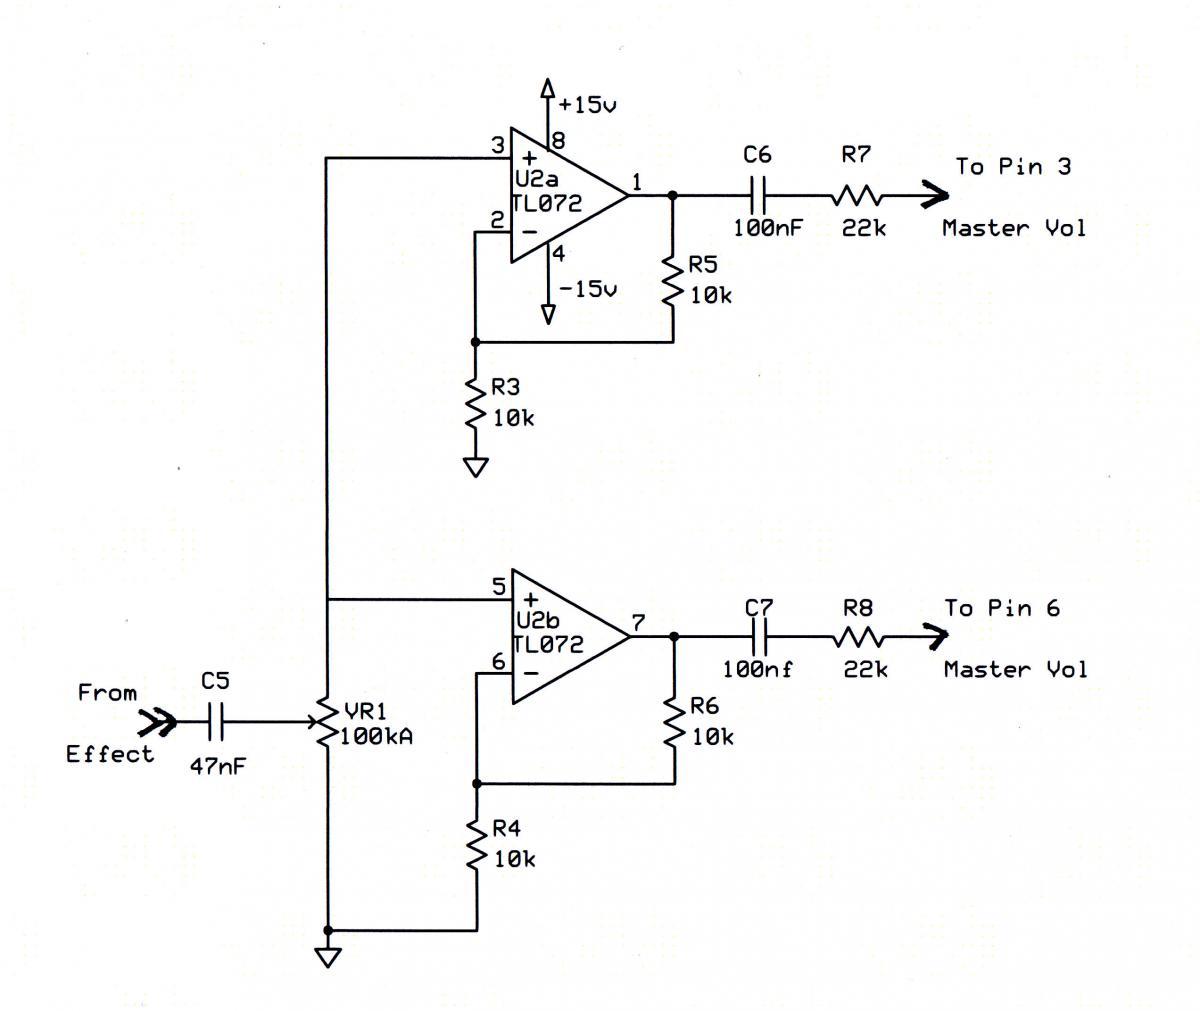 Line 6 Circuit Diagram Schematic Diagrams Speaker Amplifiercircuit Seekiccom For Pod Xt 2 0 Pocket Floorpods Labeled